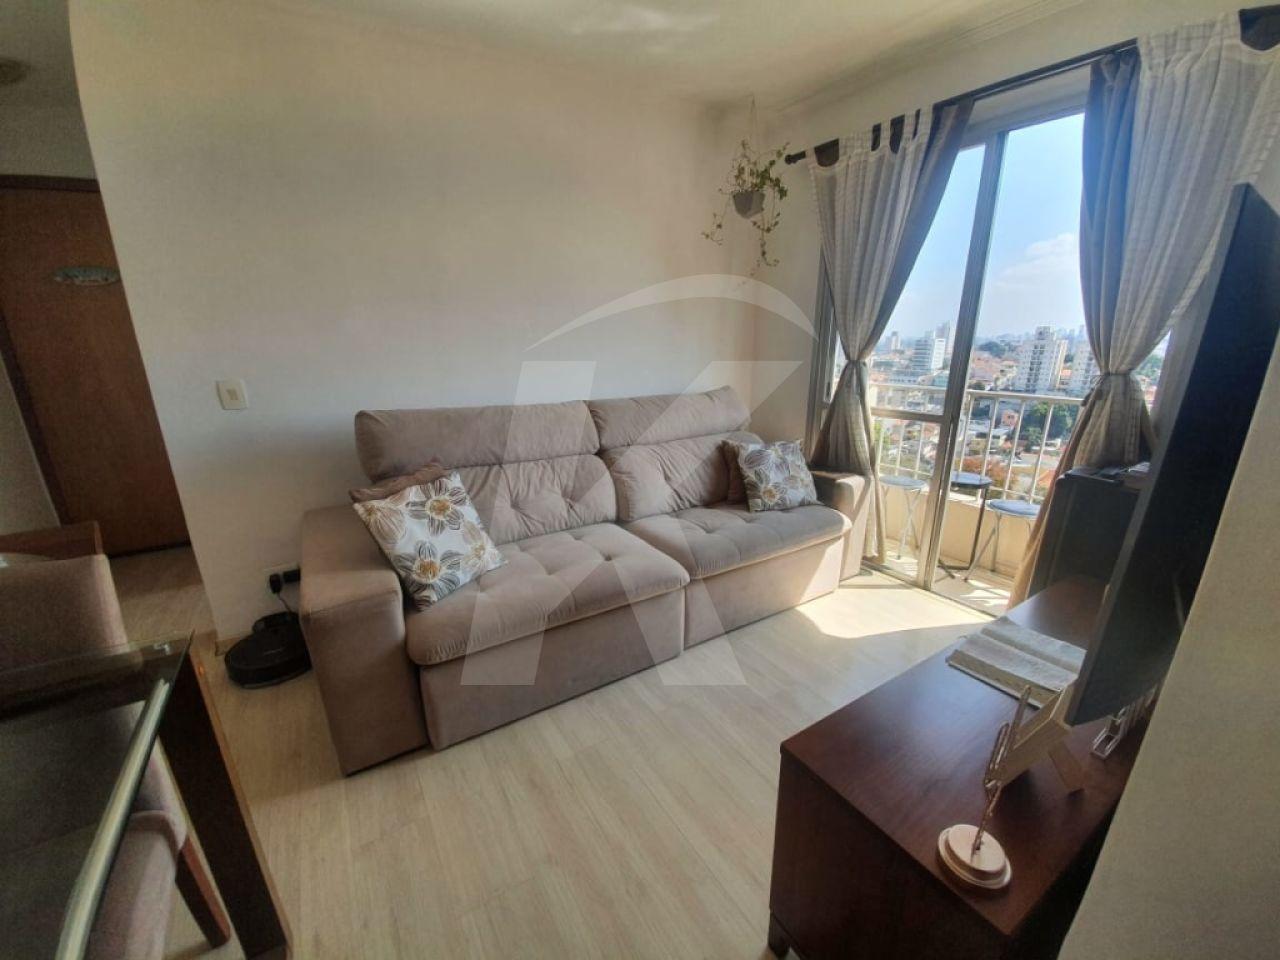 Comprar - Apartamento - Vila Paiva - 1 dormitórios.